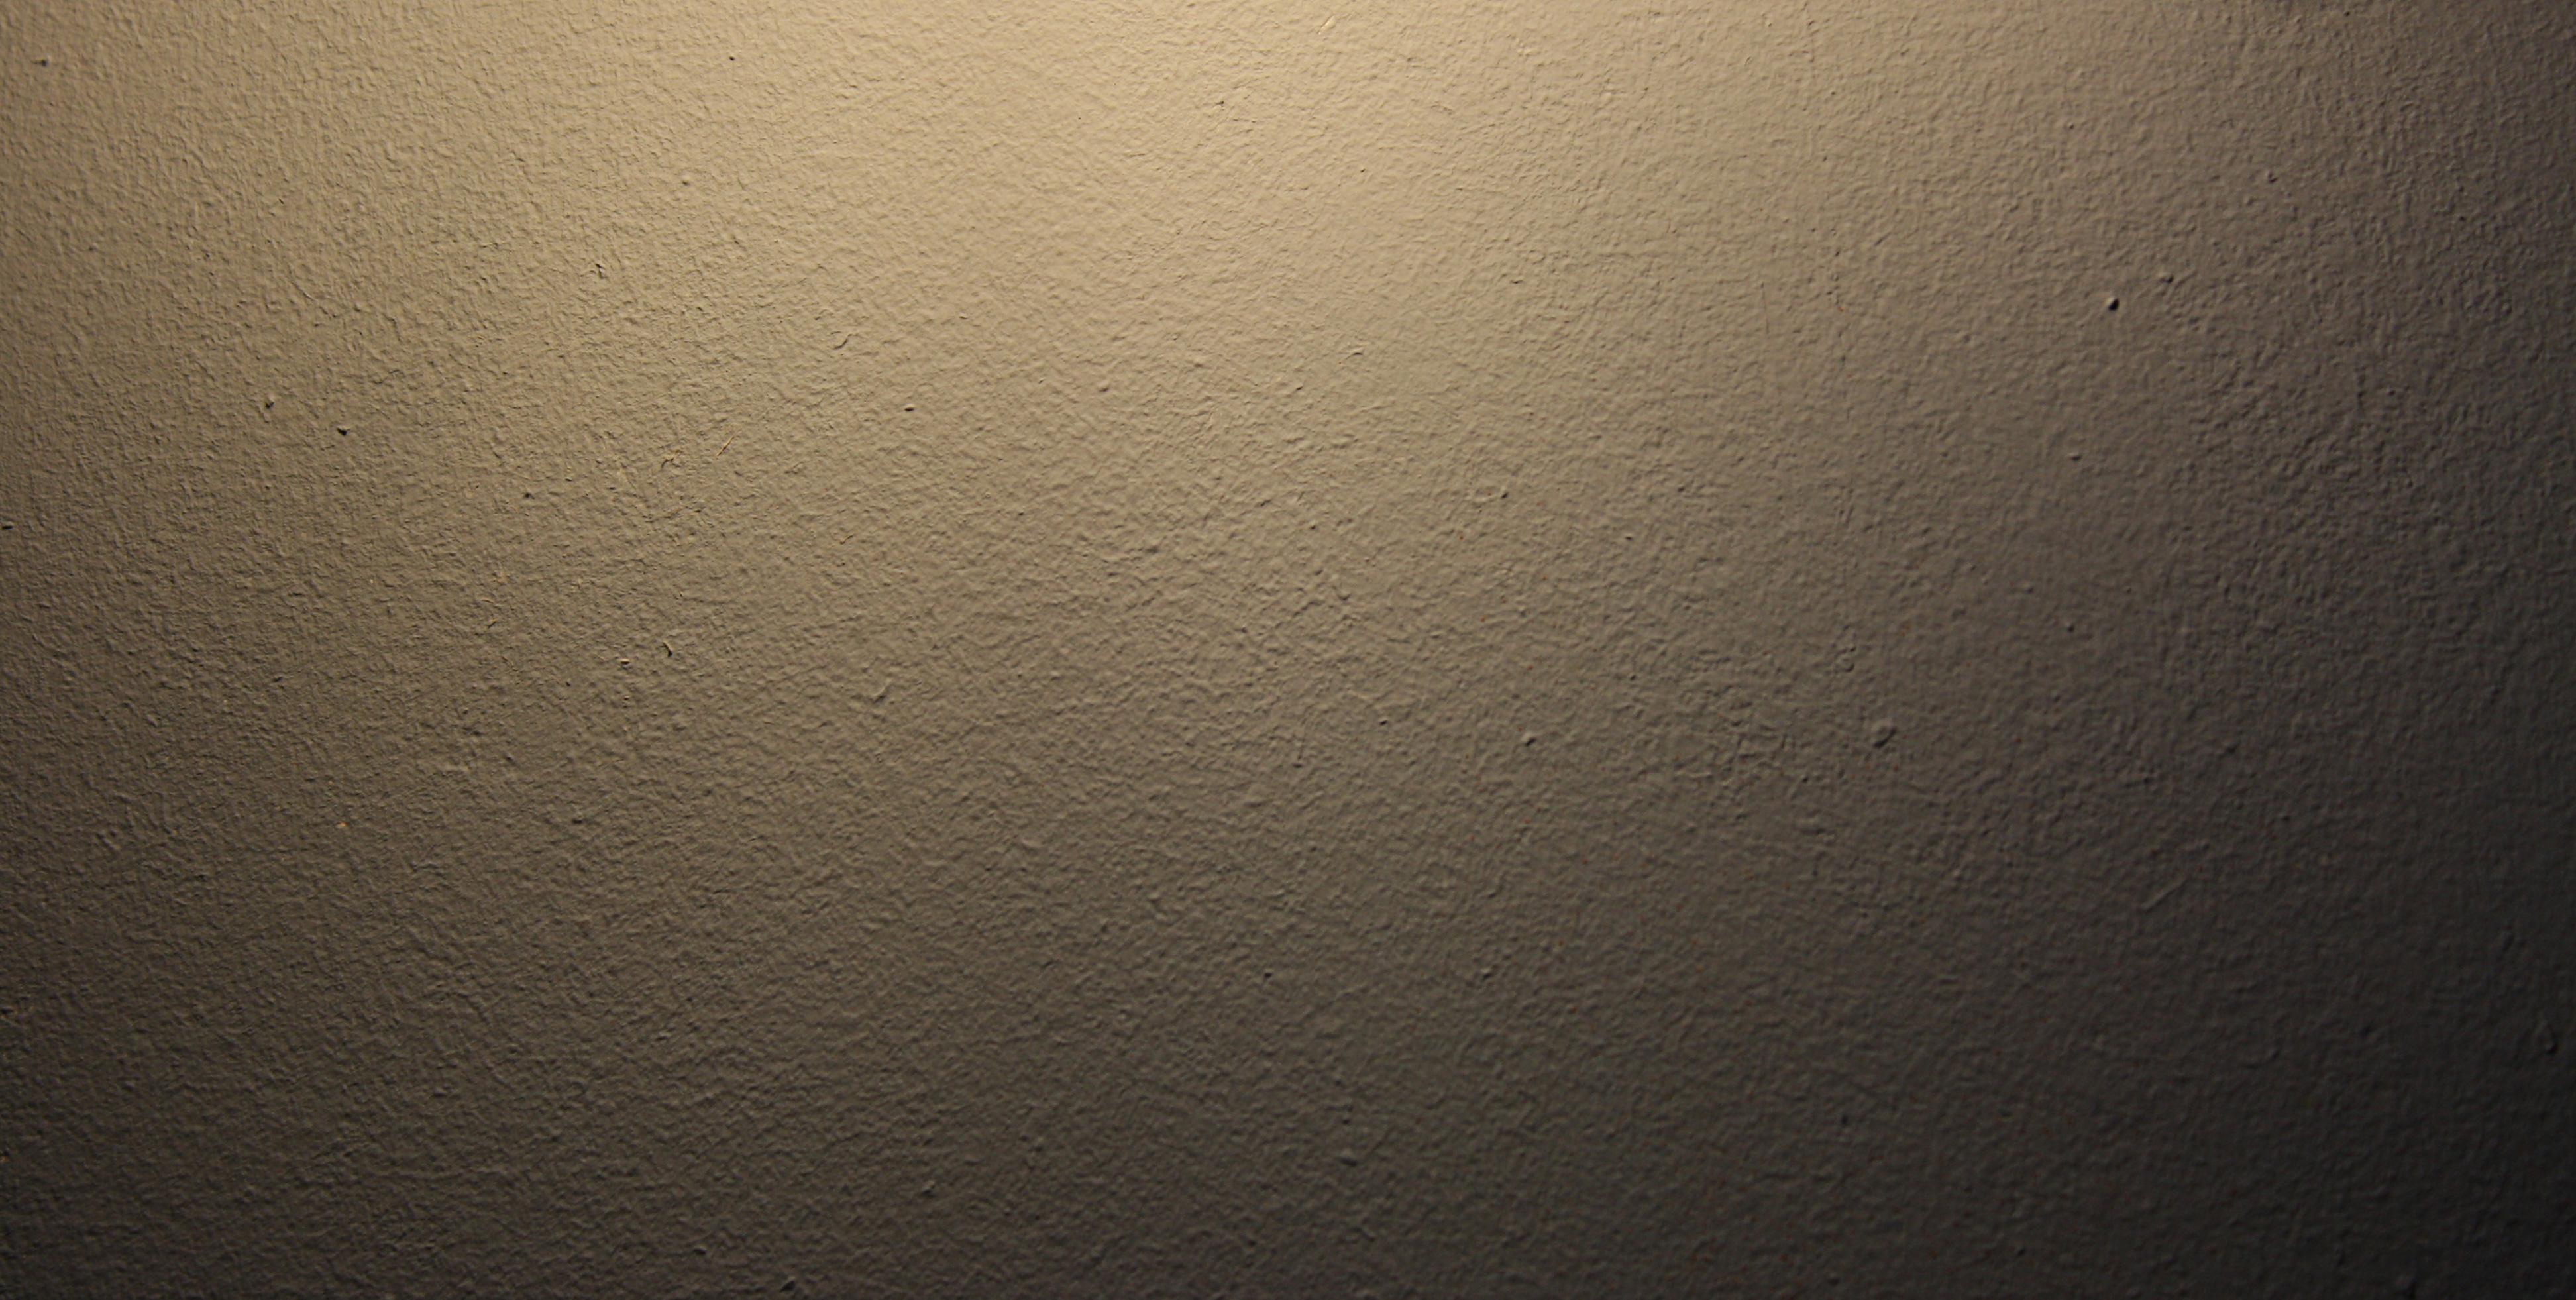 3 hi res wall textures texture fabrik for High resolution textures